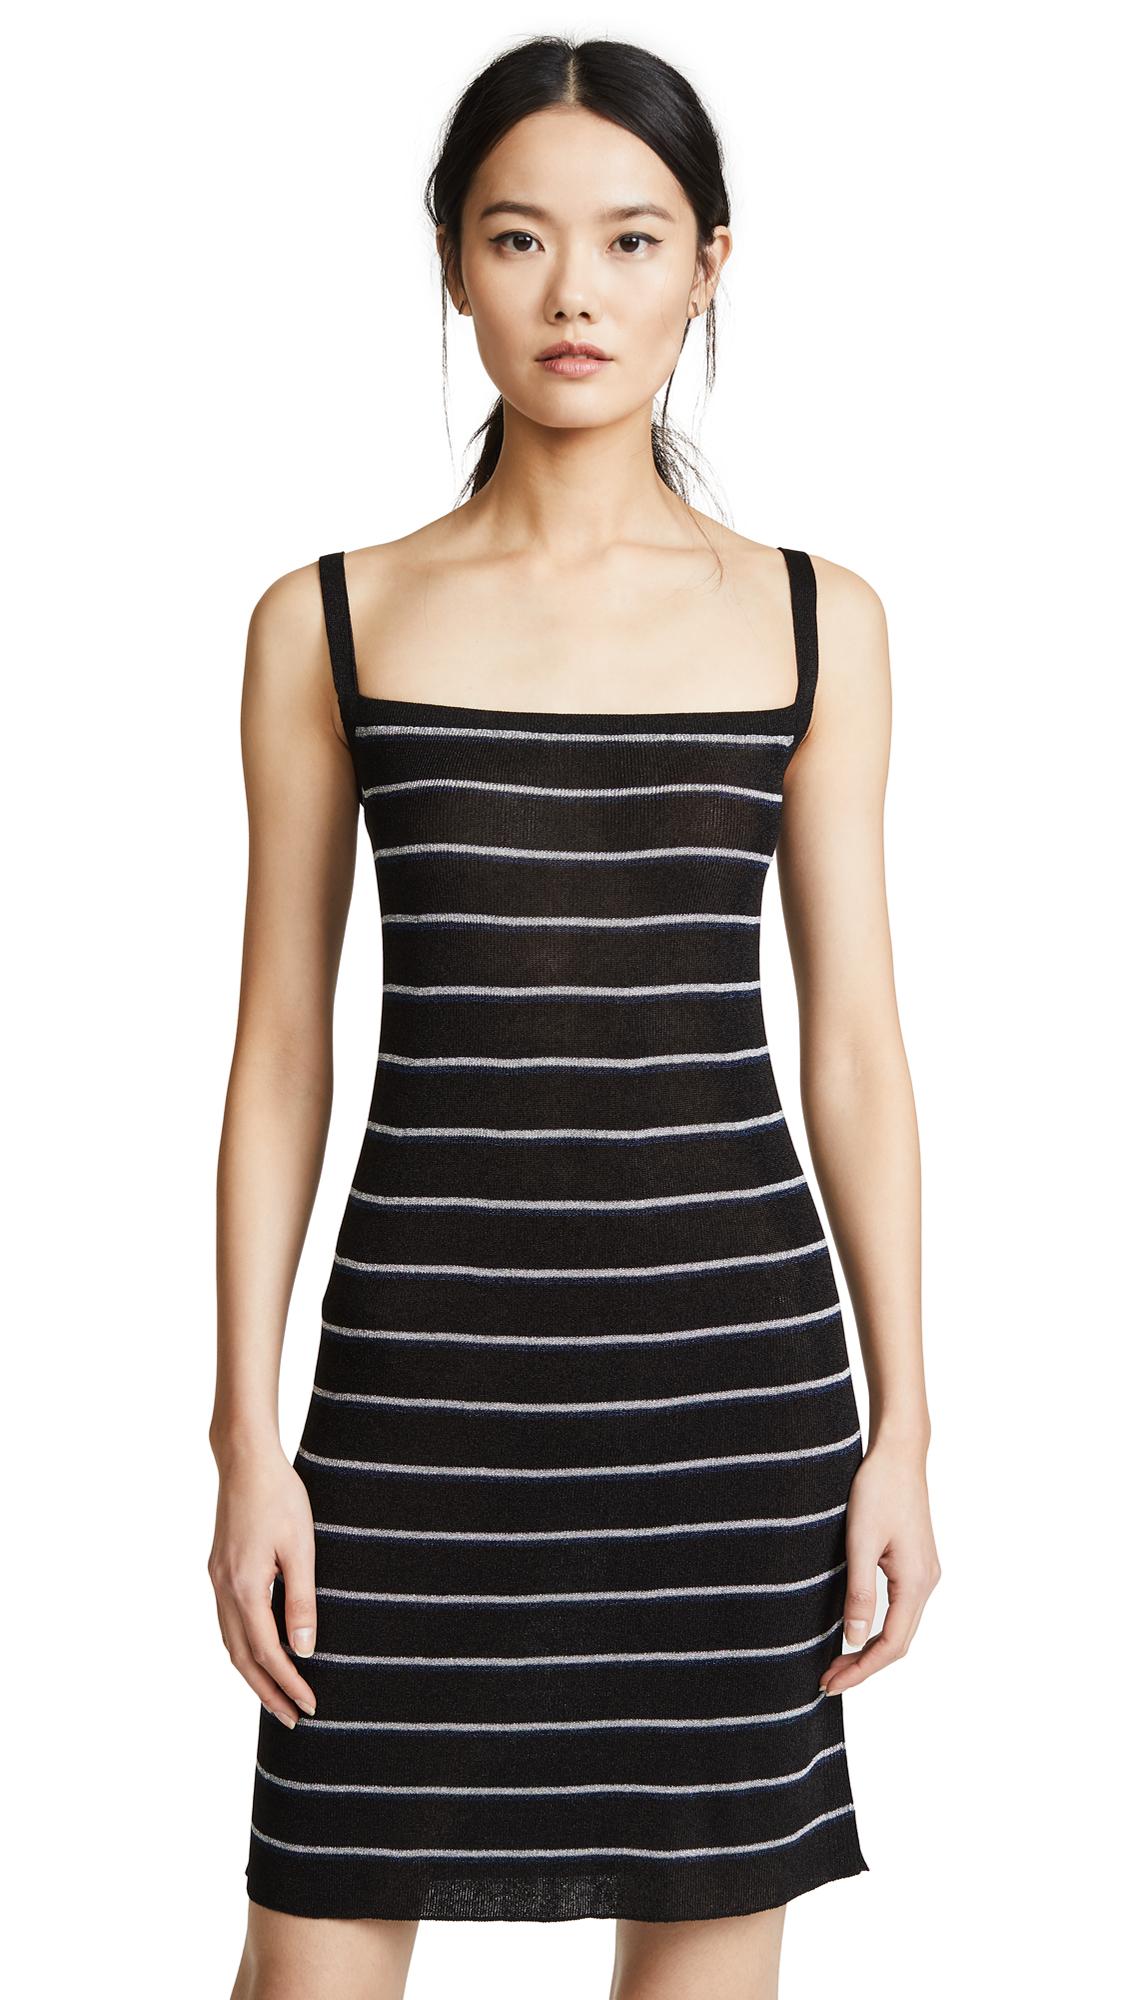 Sonia Rykiel Striped Ribbed Mini Dress